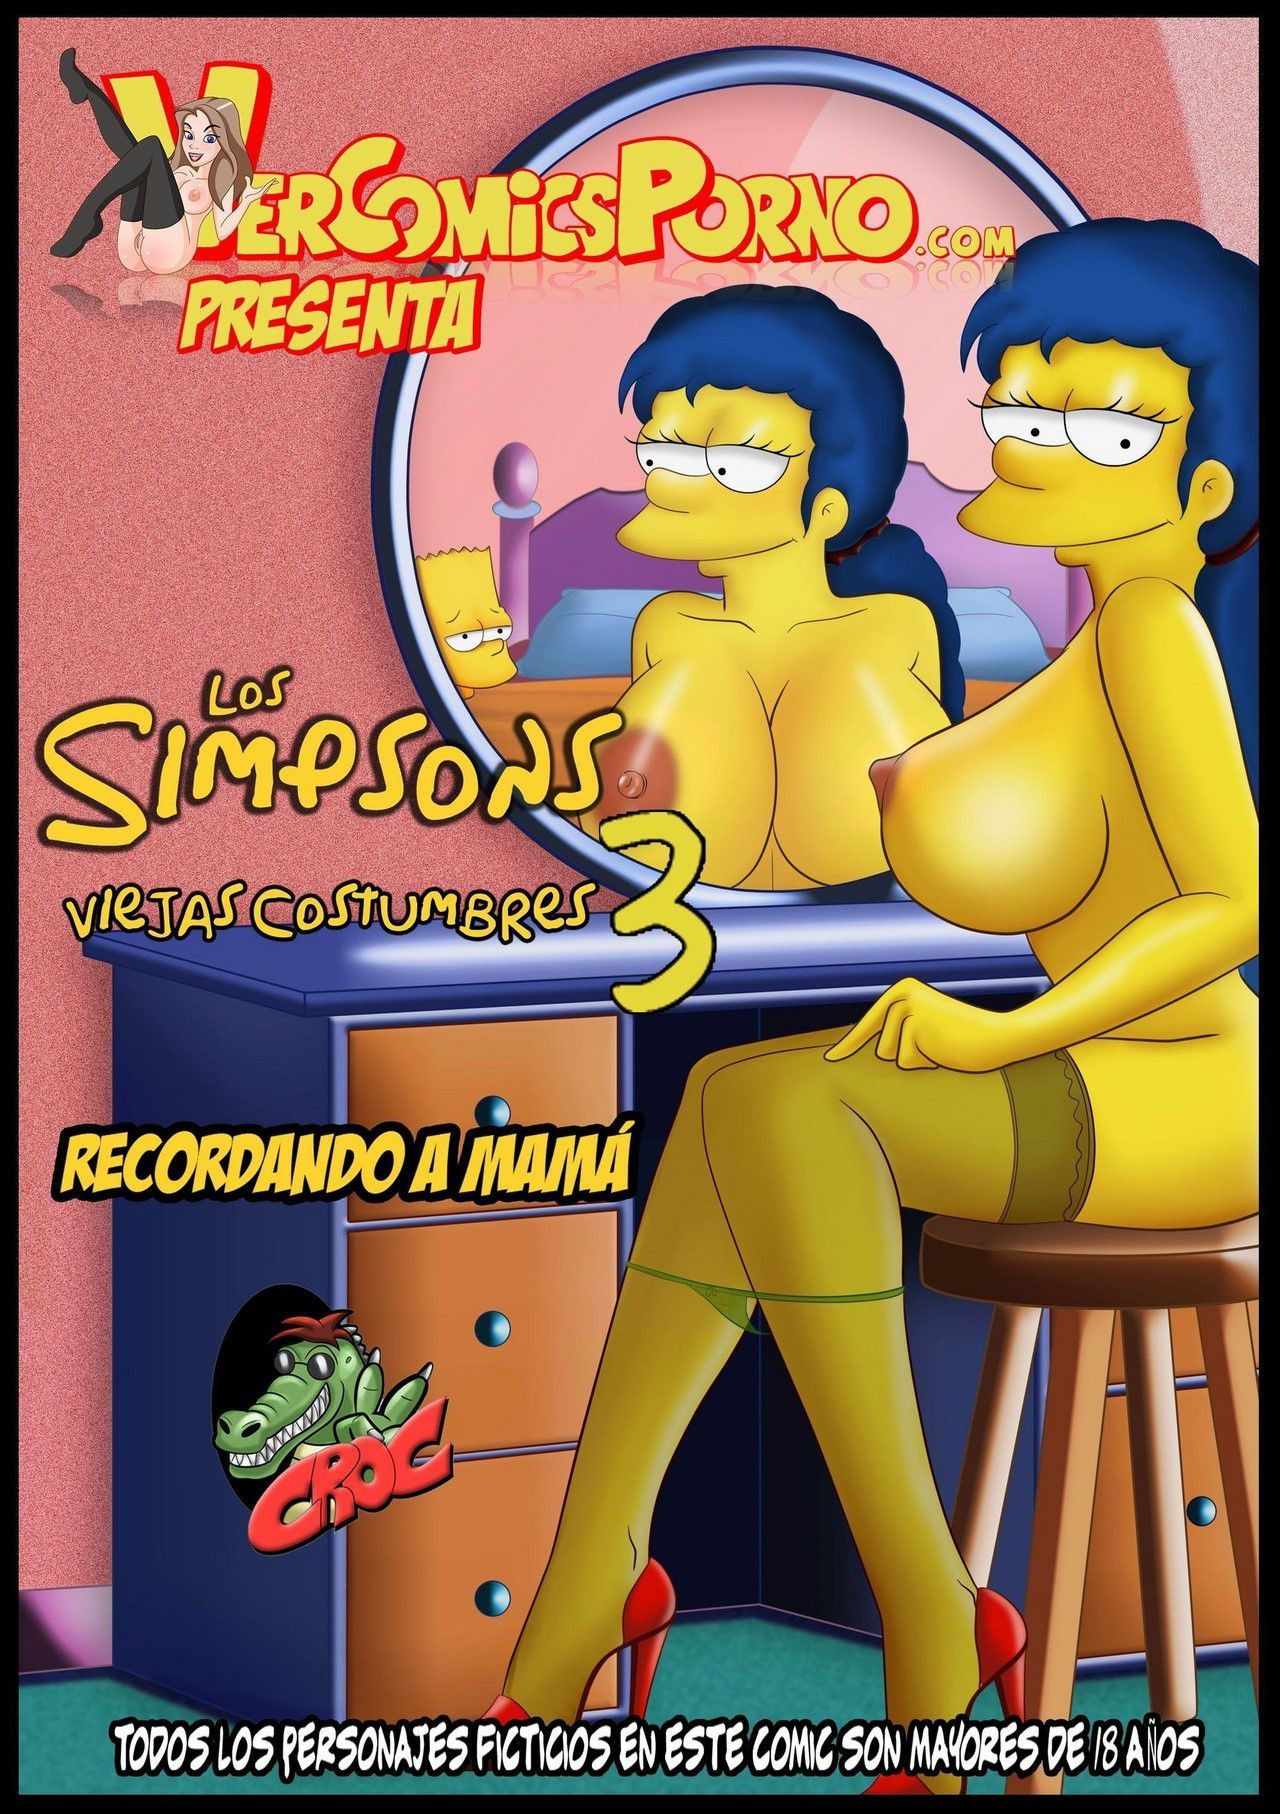 Anciennes coutumes 3 љ Le Simpson Porno[